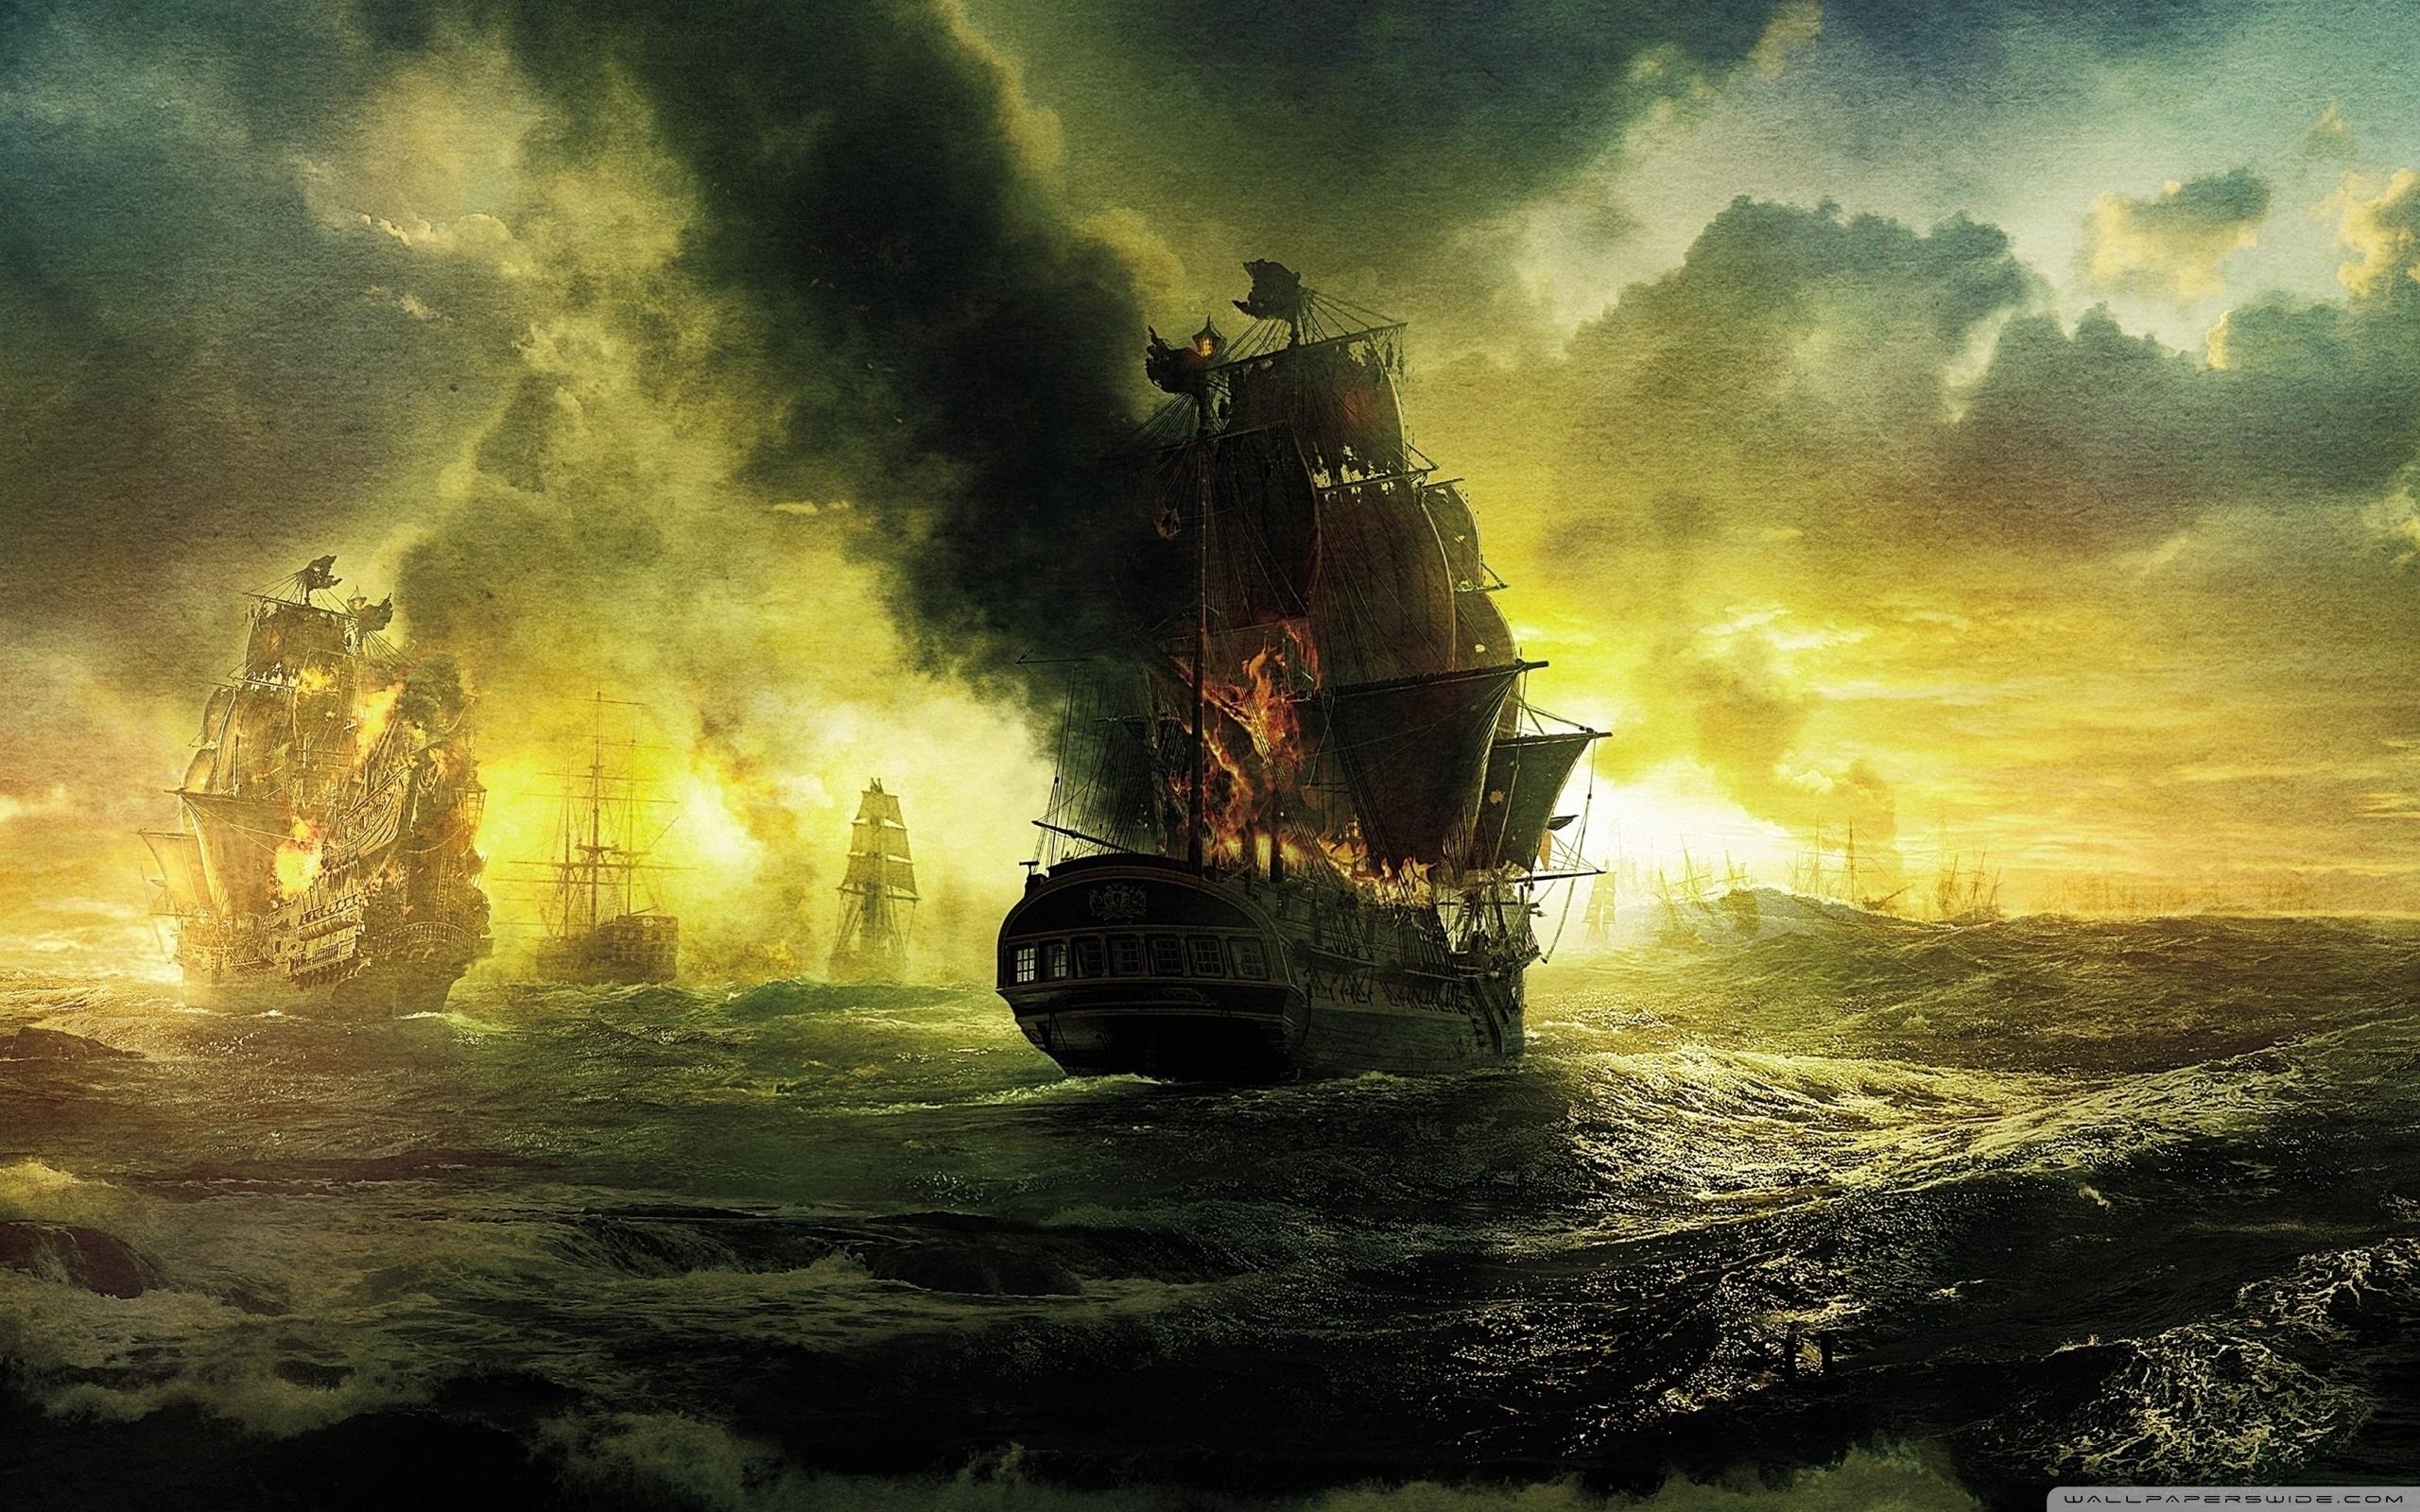 2011 pirates of the caribbean on stranger tides ❤ 4k hd desktop